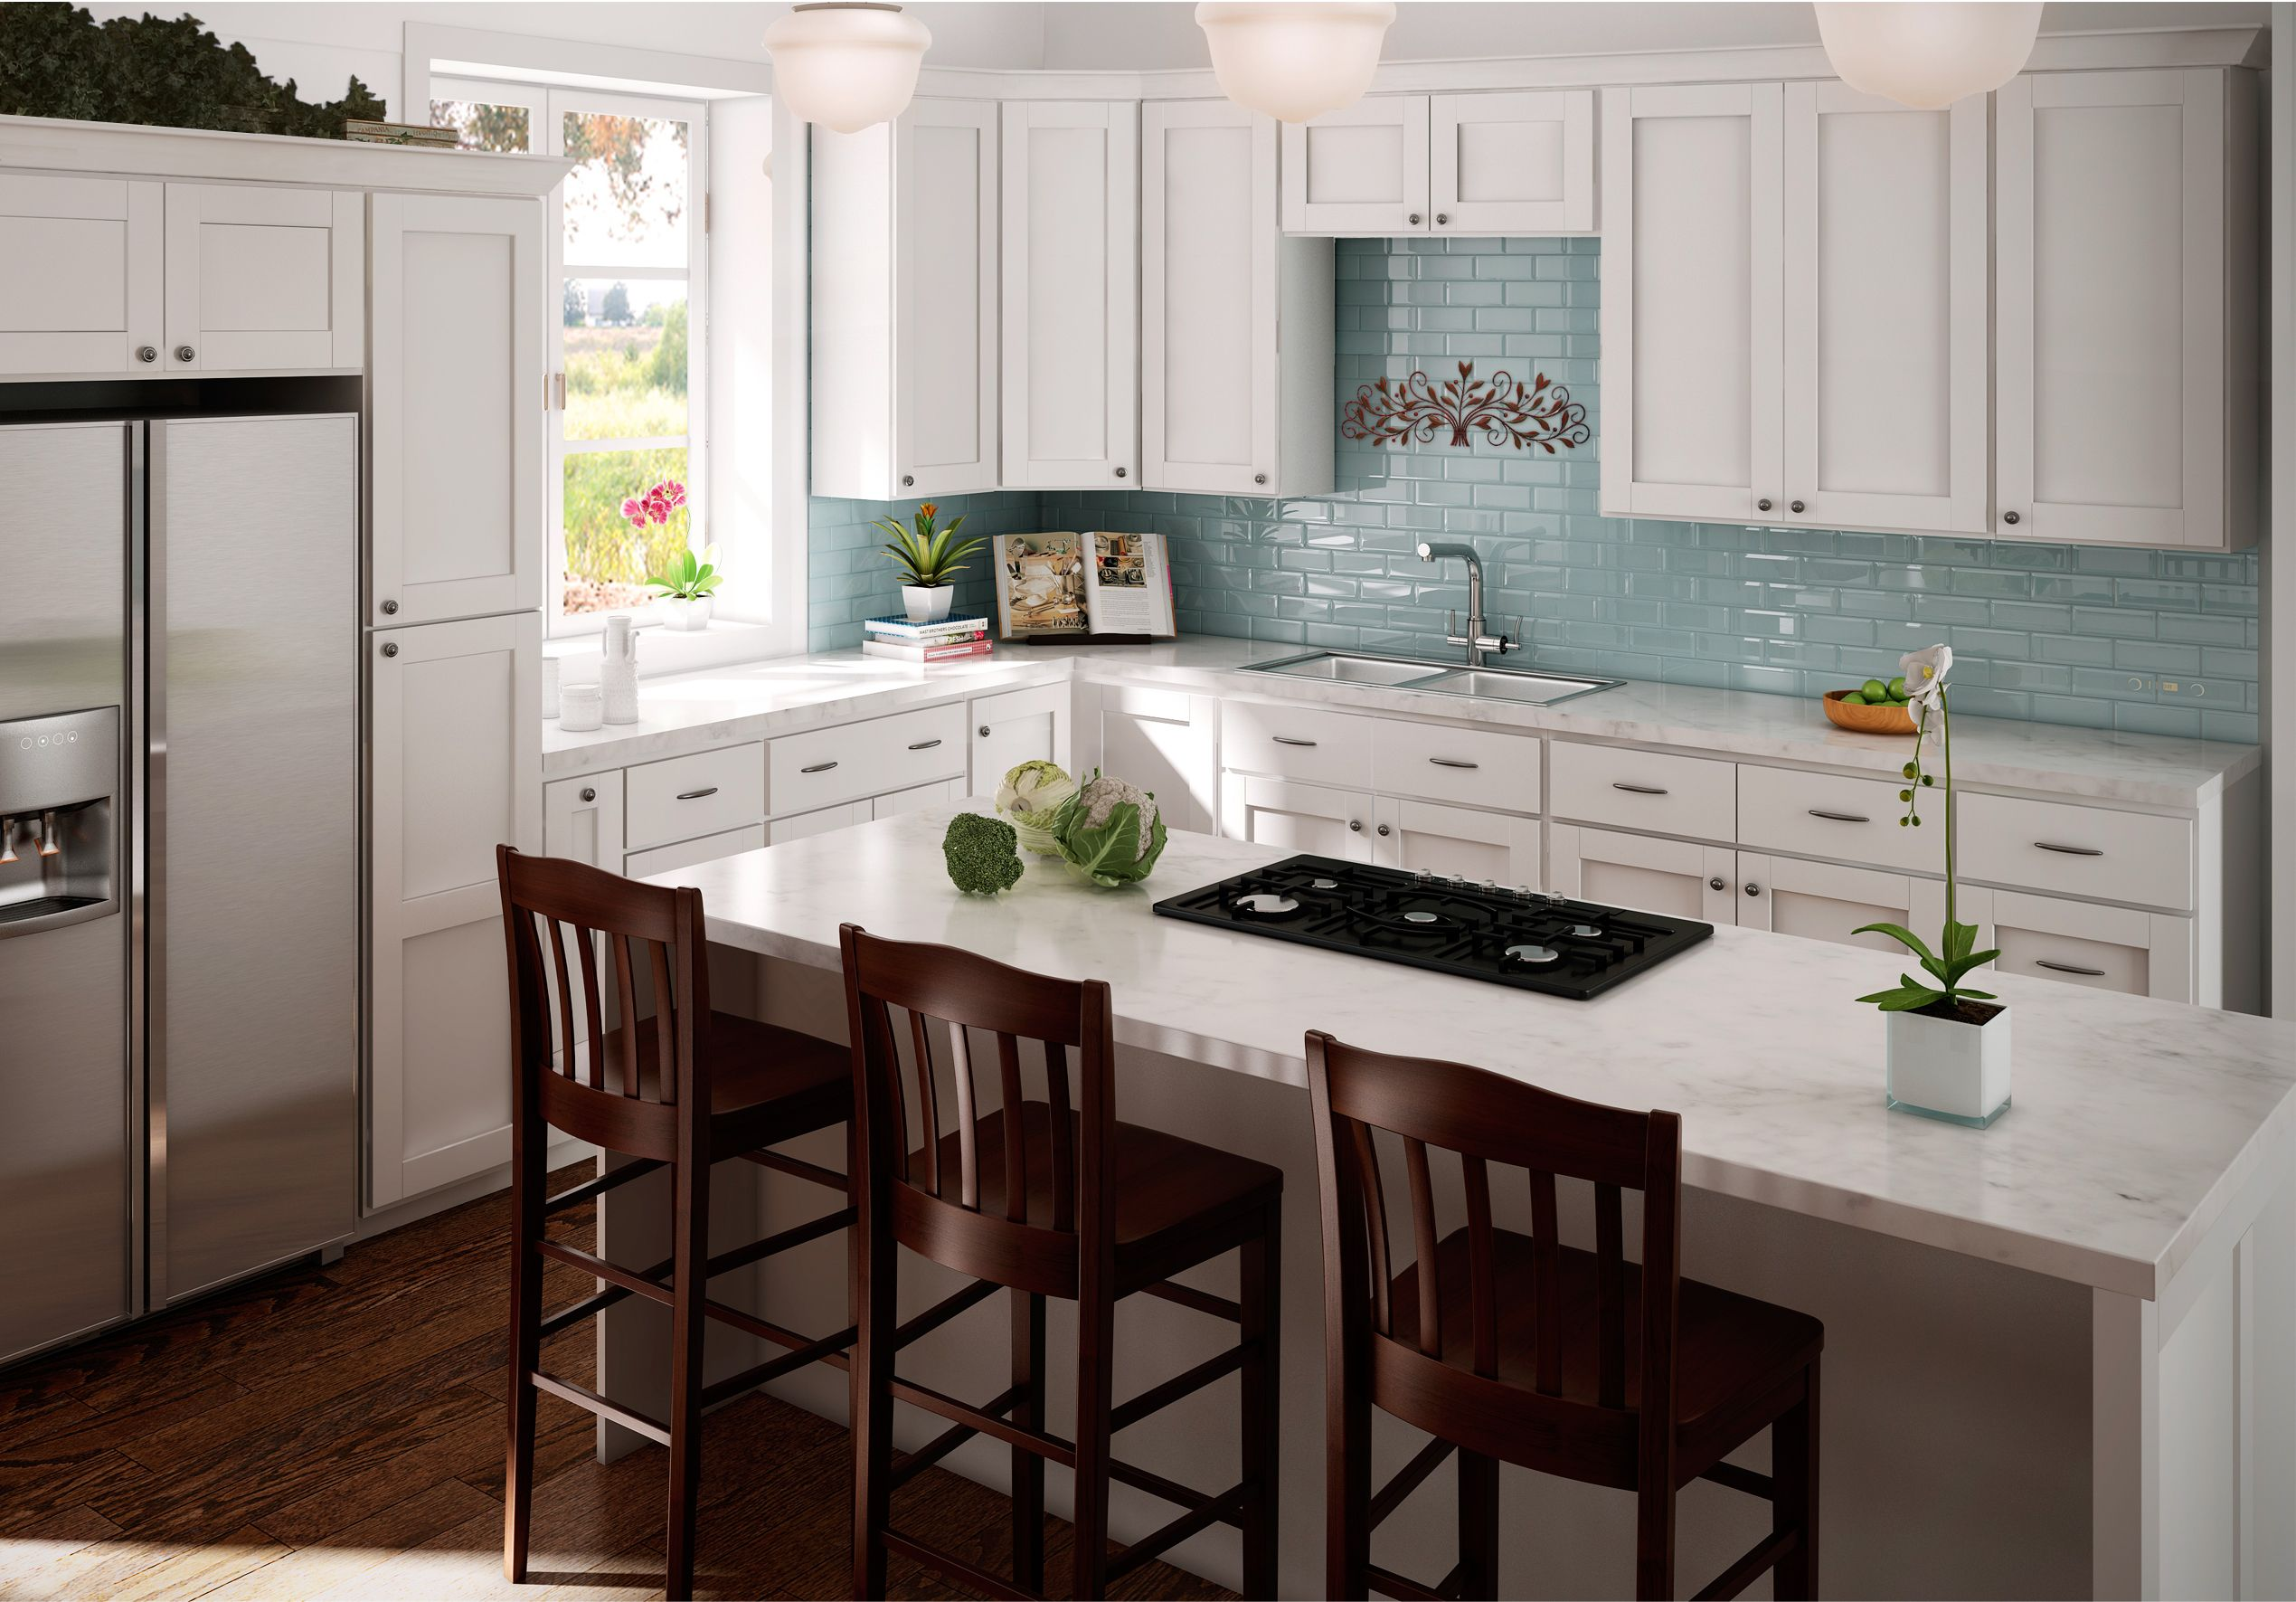 Sunnywood Shaker Hill White Kitchen Cabinets Kitchen Cabinets Kitchen And Bath Showroom Kitchen Utensils Store